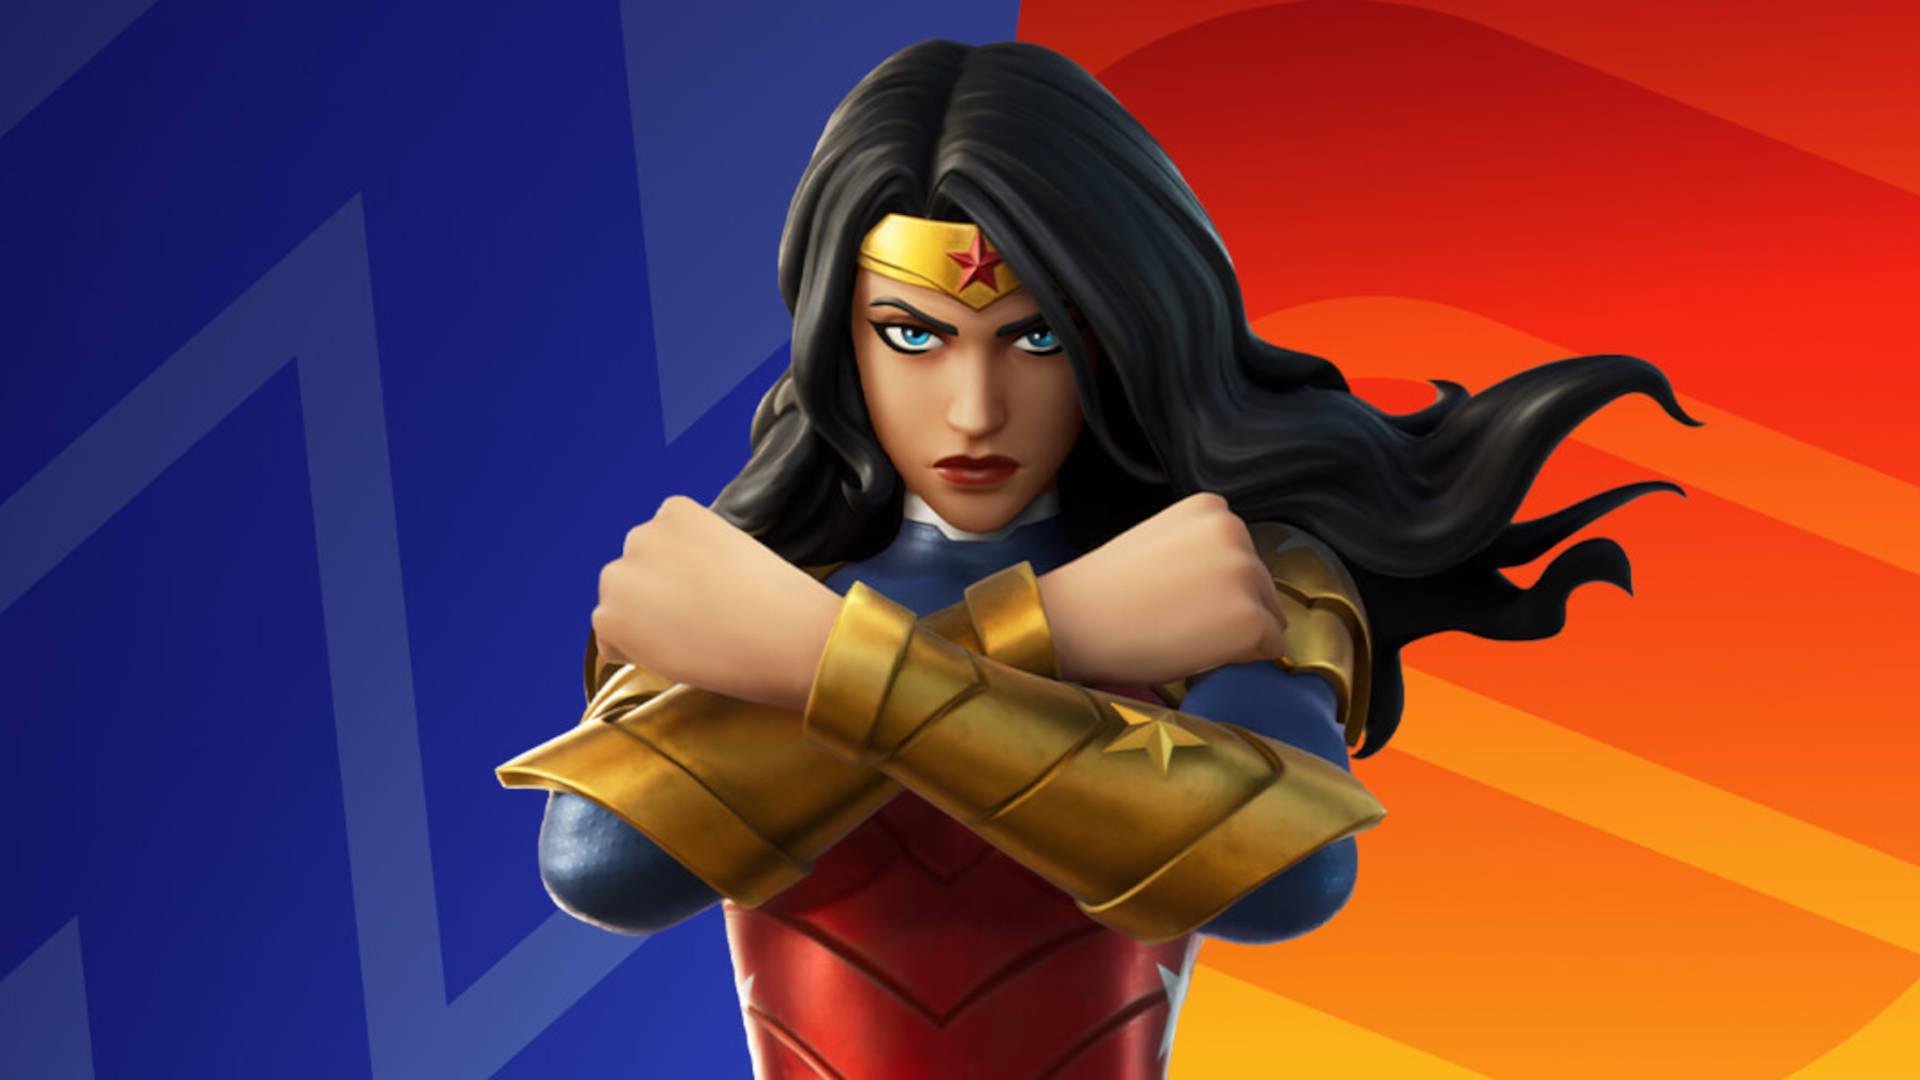 Fortnite Wonder Woman cup – unlock the Wonder Woman skin